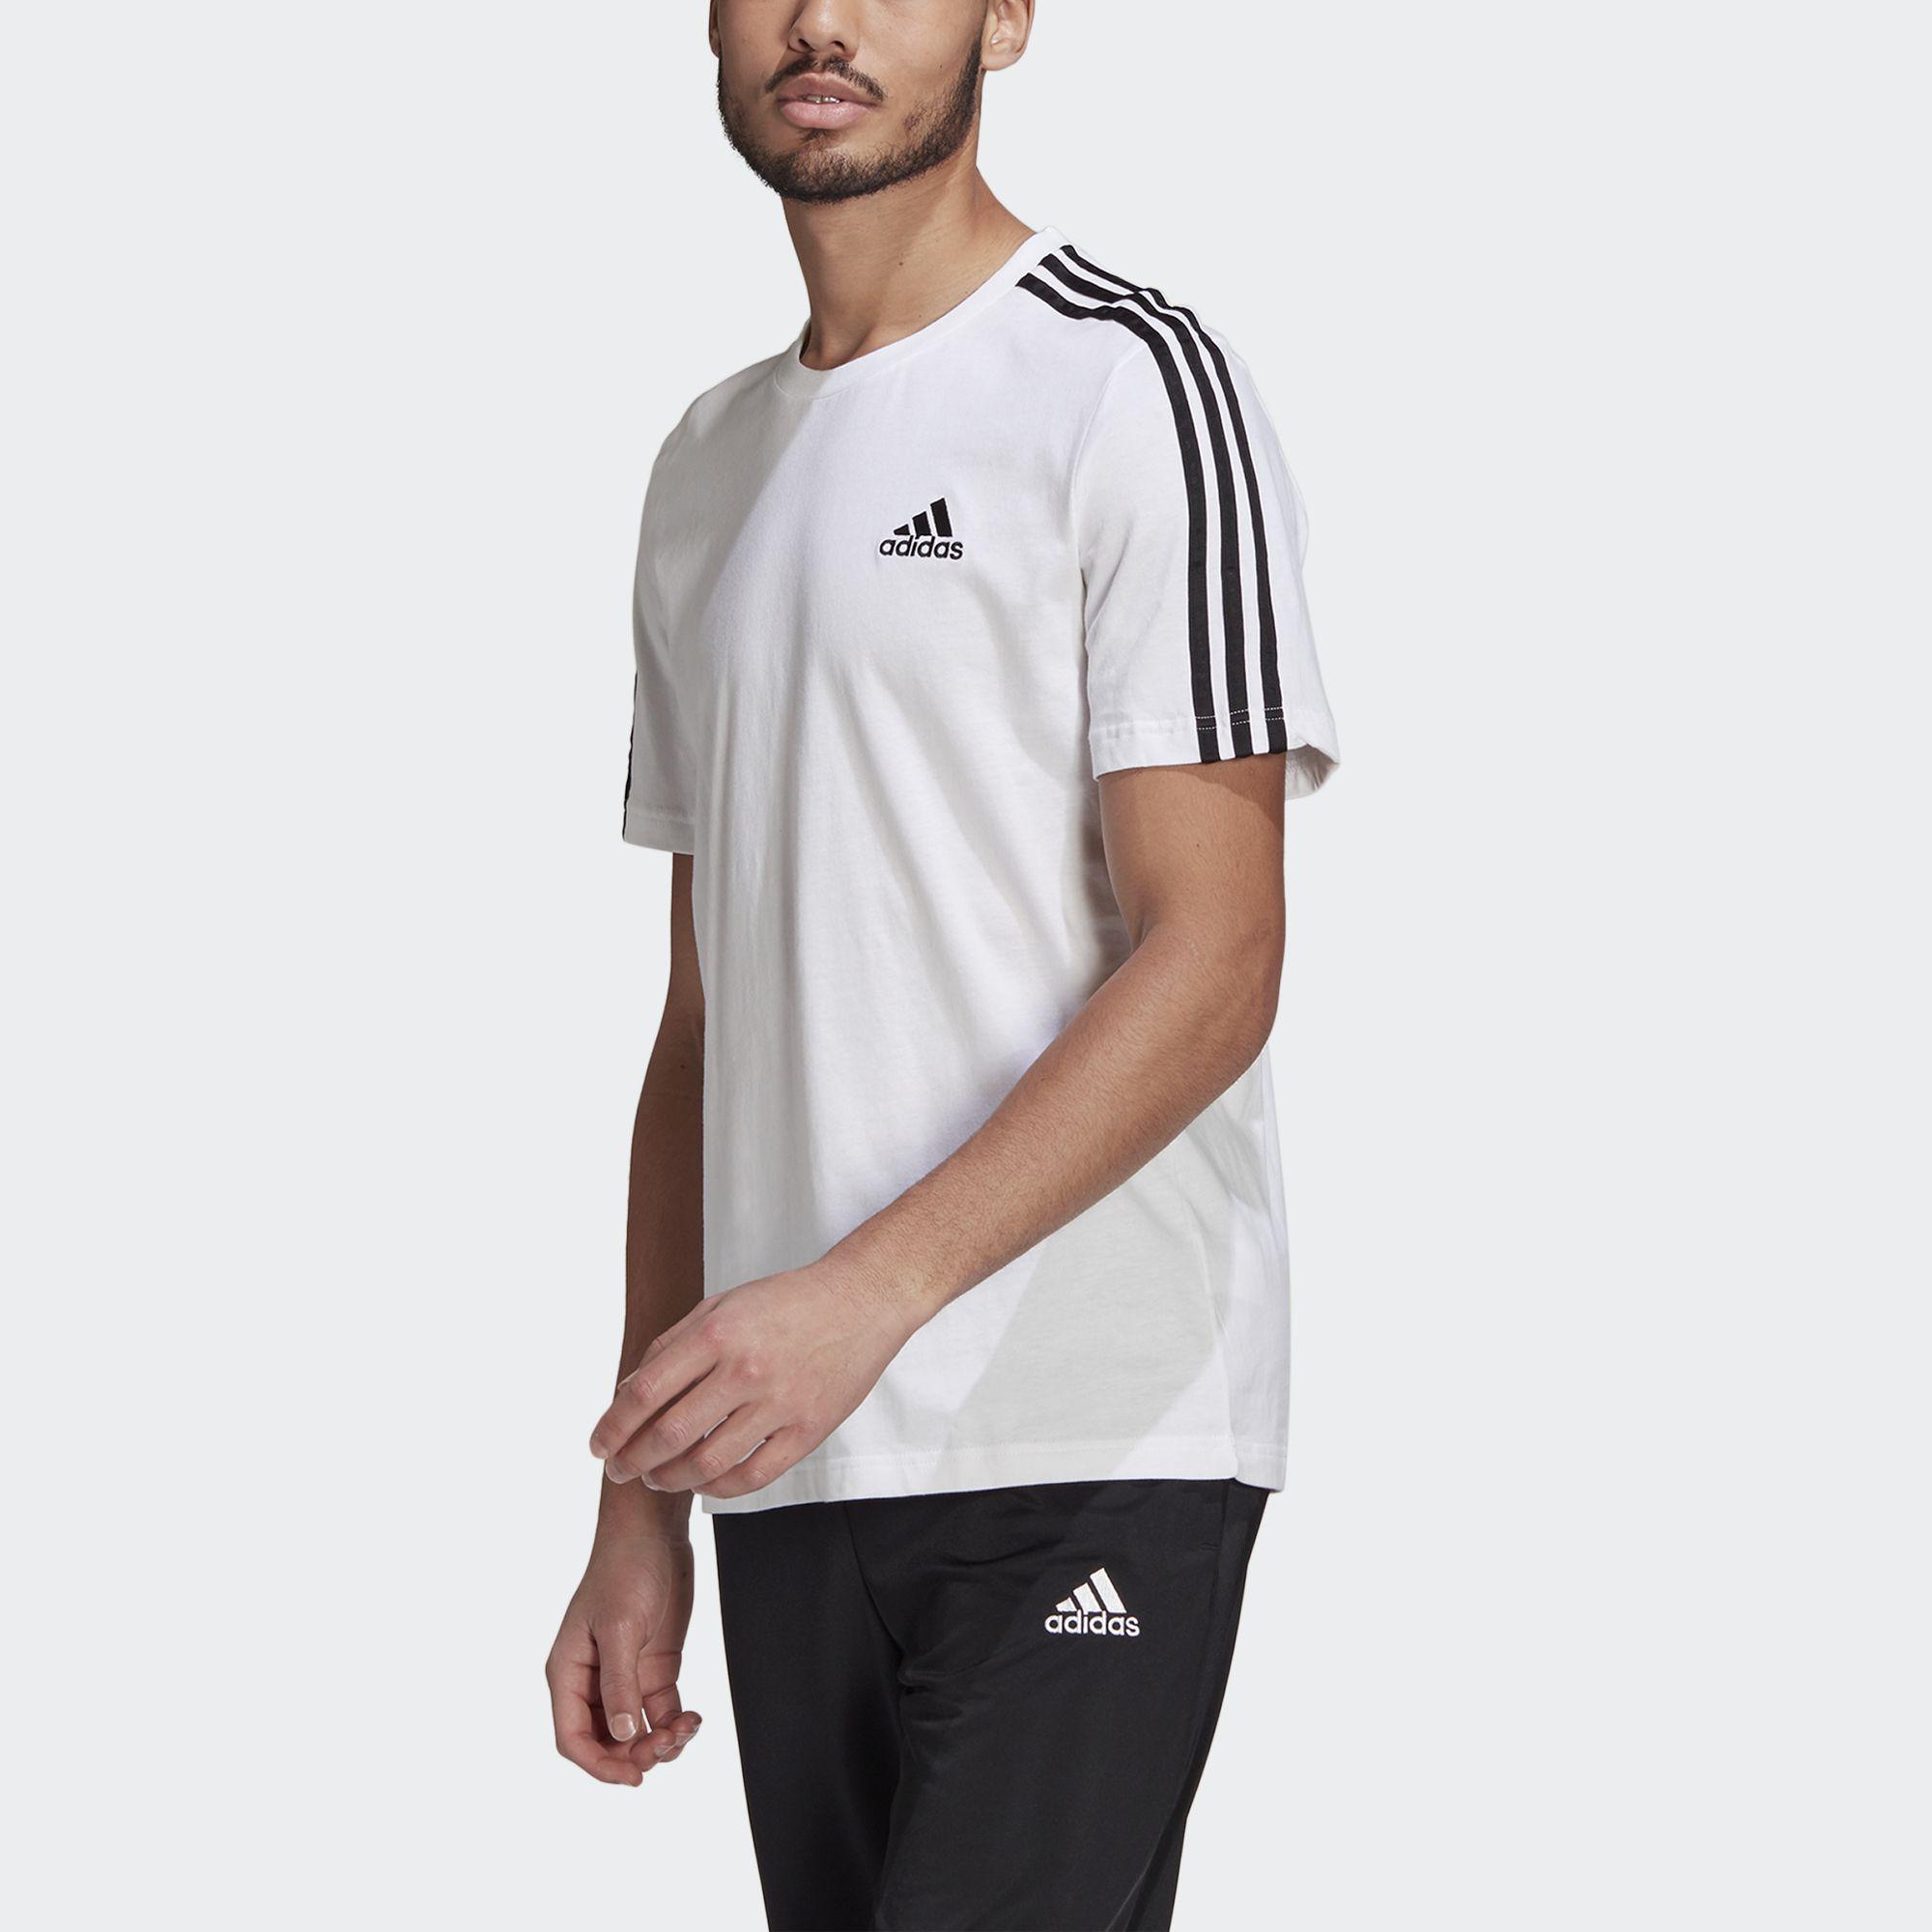 adidas NOT SPORTS SPECIFIC เสื้อยืด Essentials 3-Stripes ผู้ชาย สีขาว GL3733